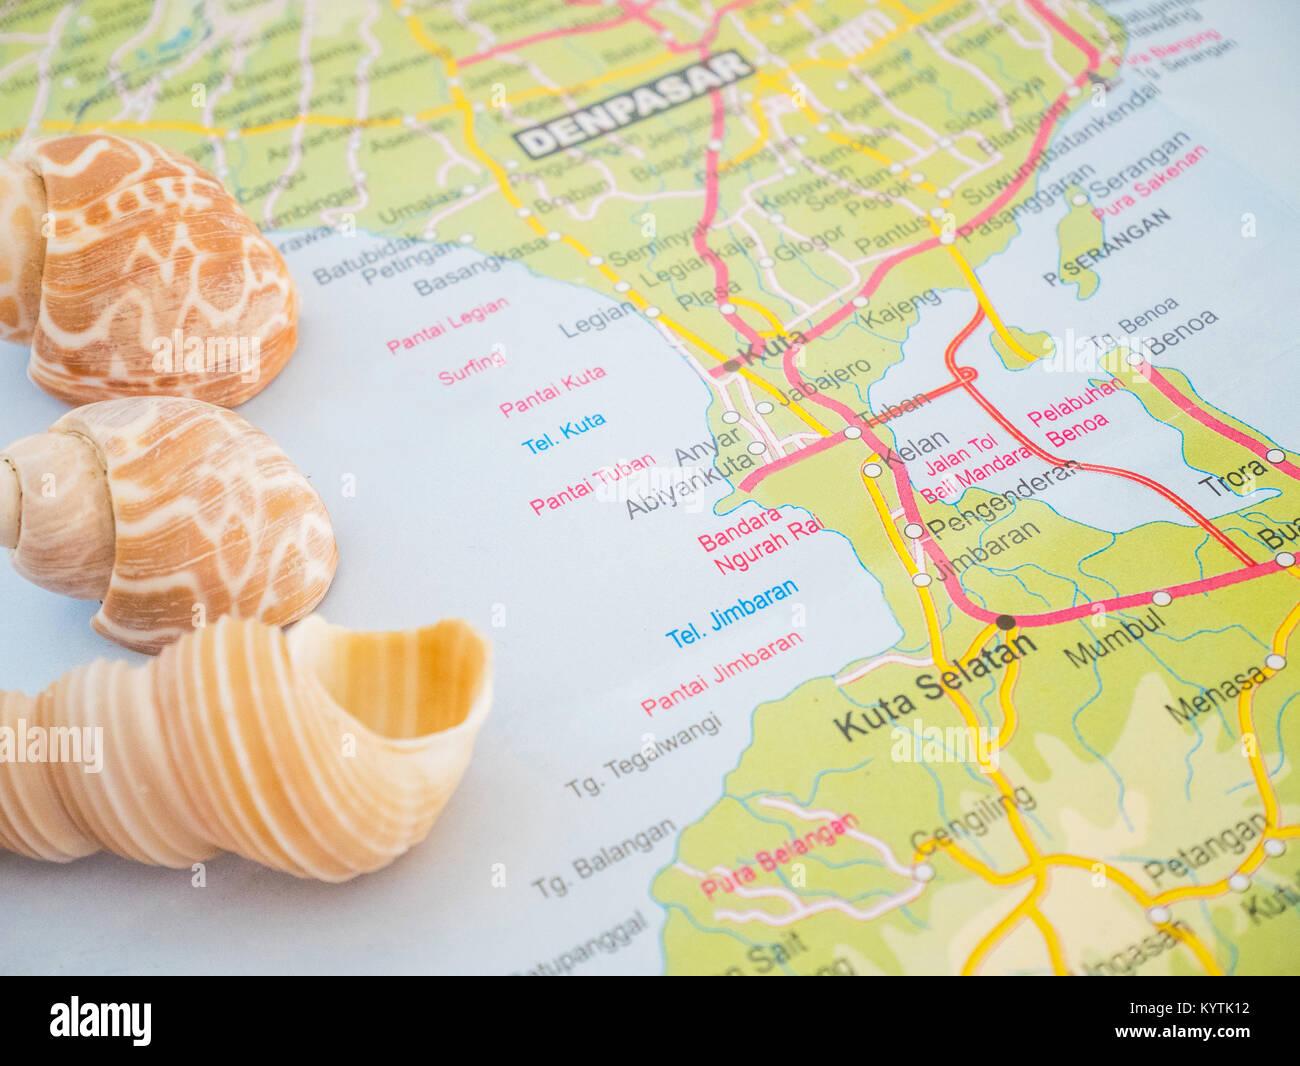 Map Bali Stockfotos & Map Bali Bilder - Alamy